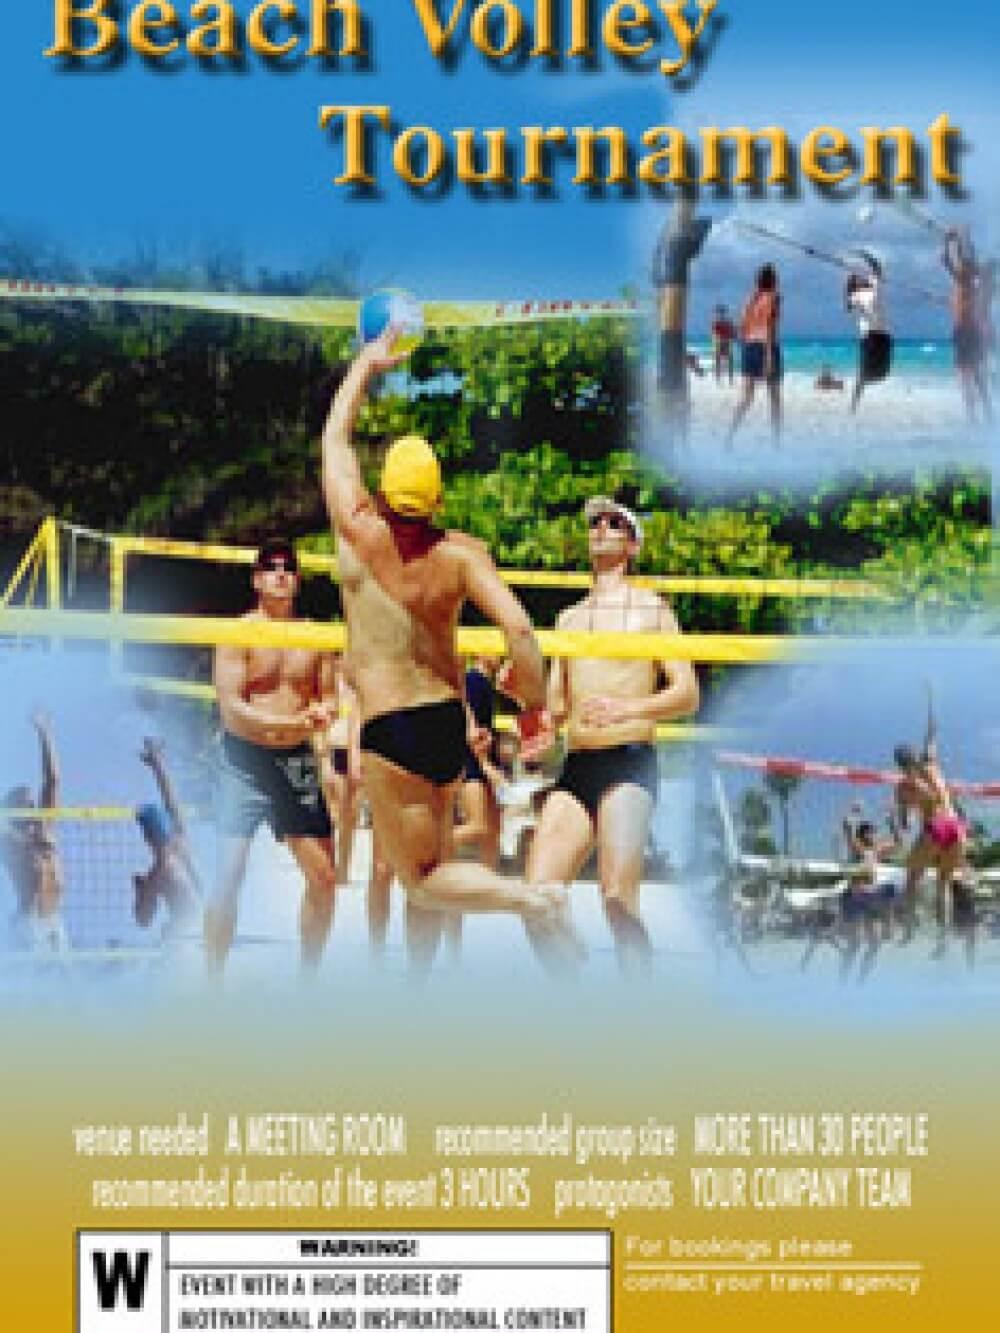 beach_volley_tournament_vertical_web